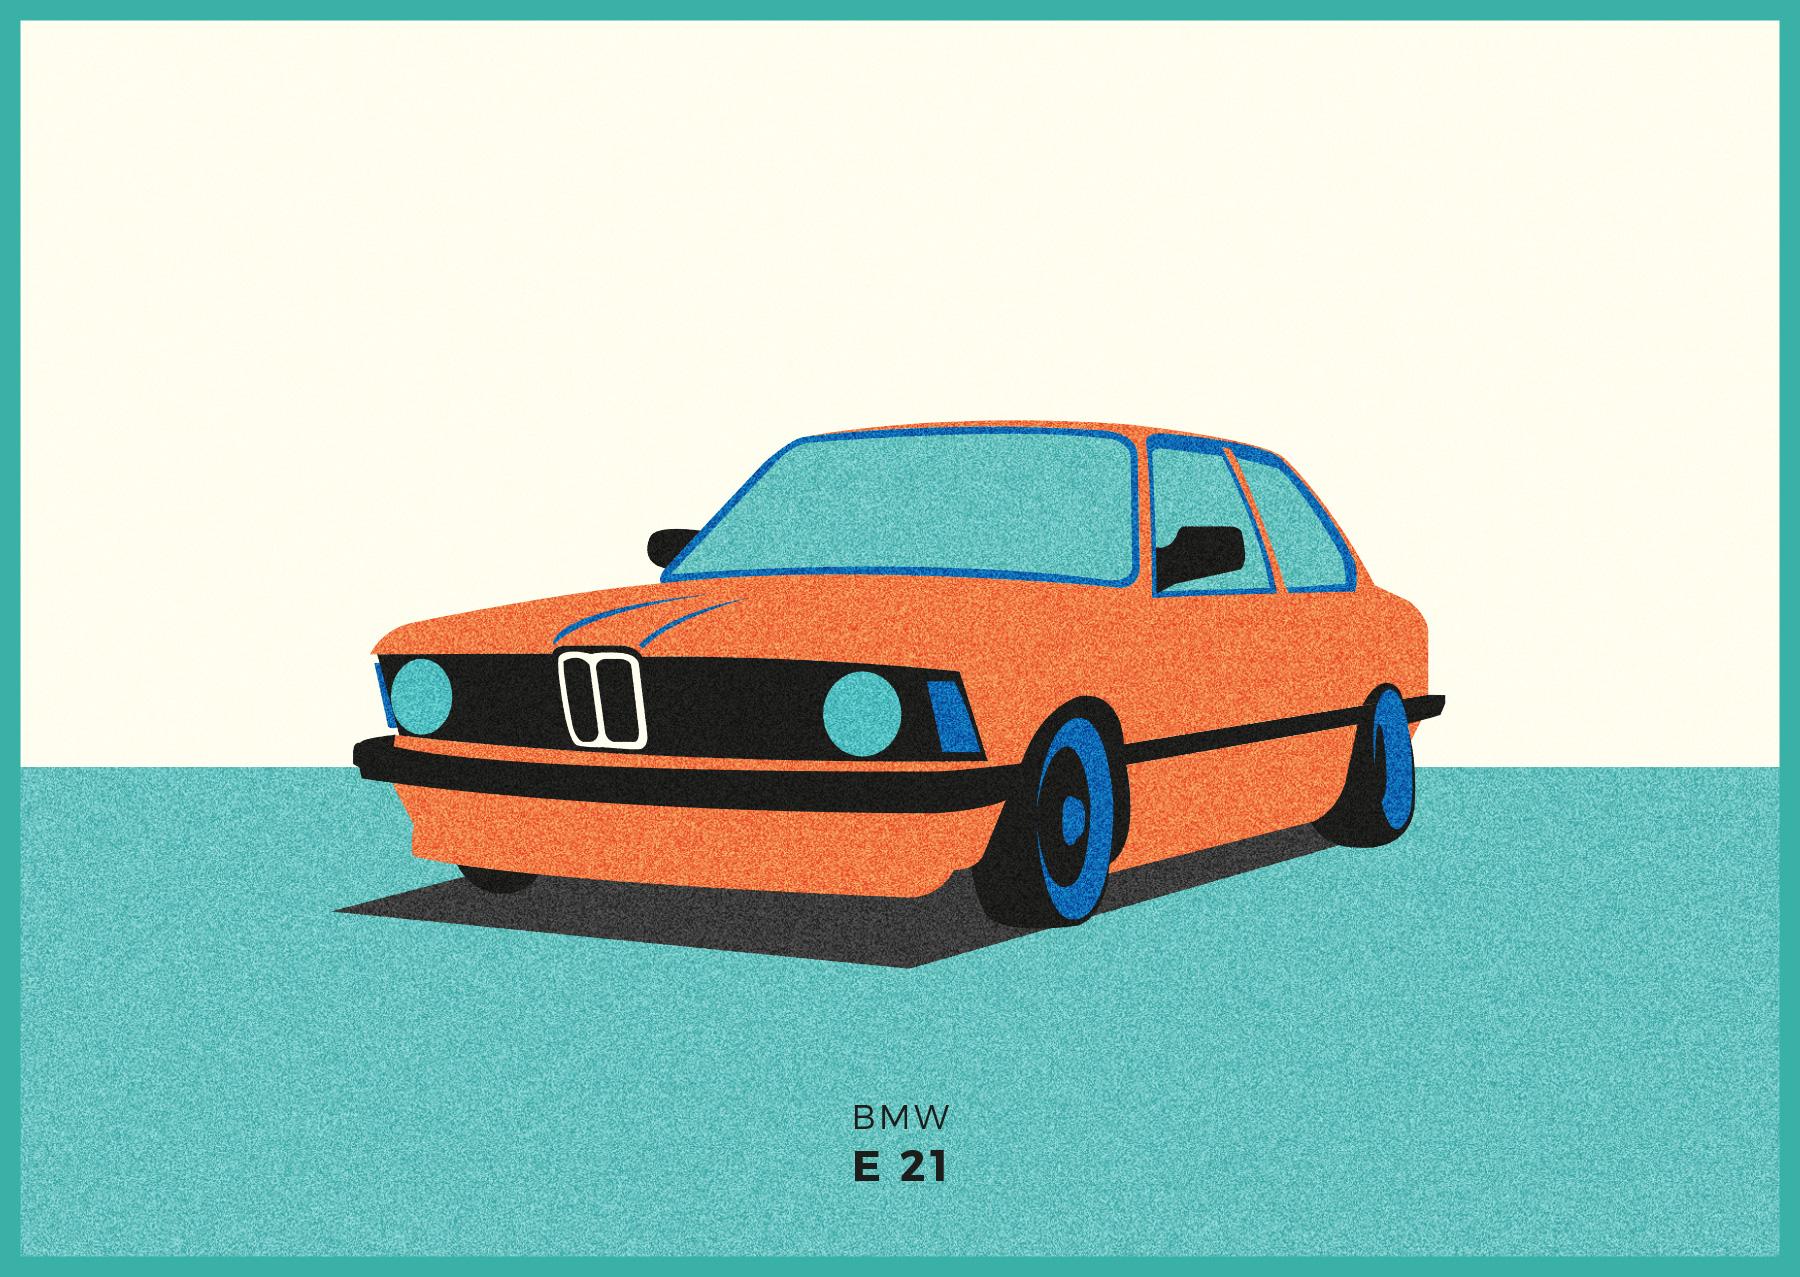 Carole_Chevalier-Iconic-cars-2.jpg